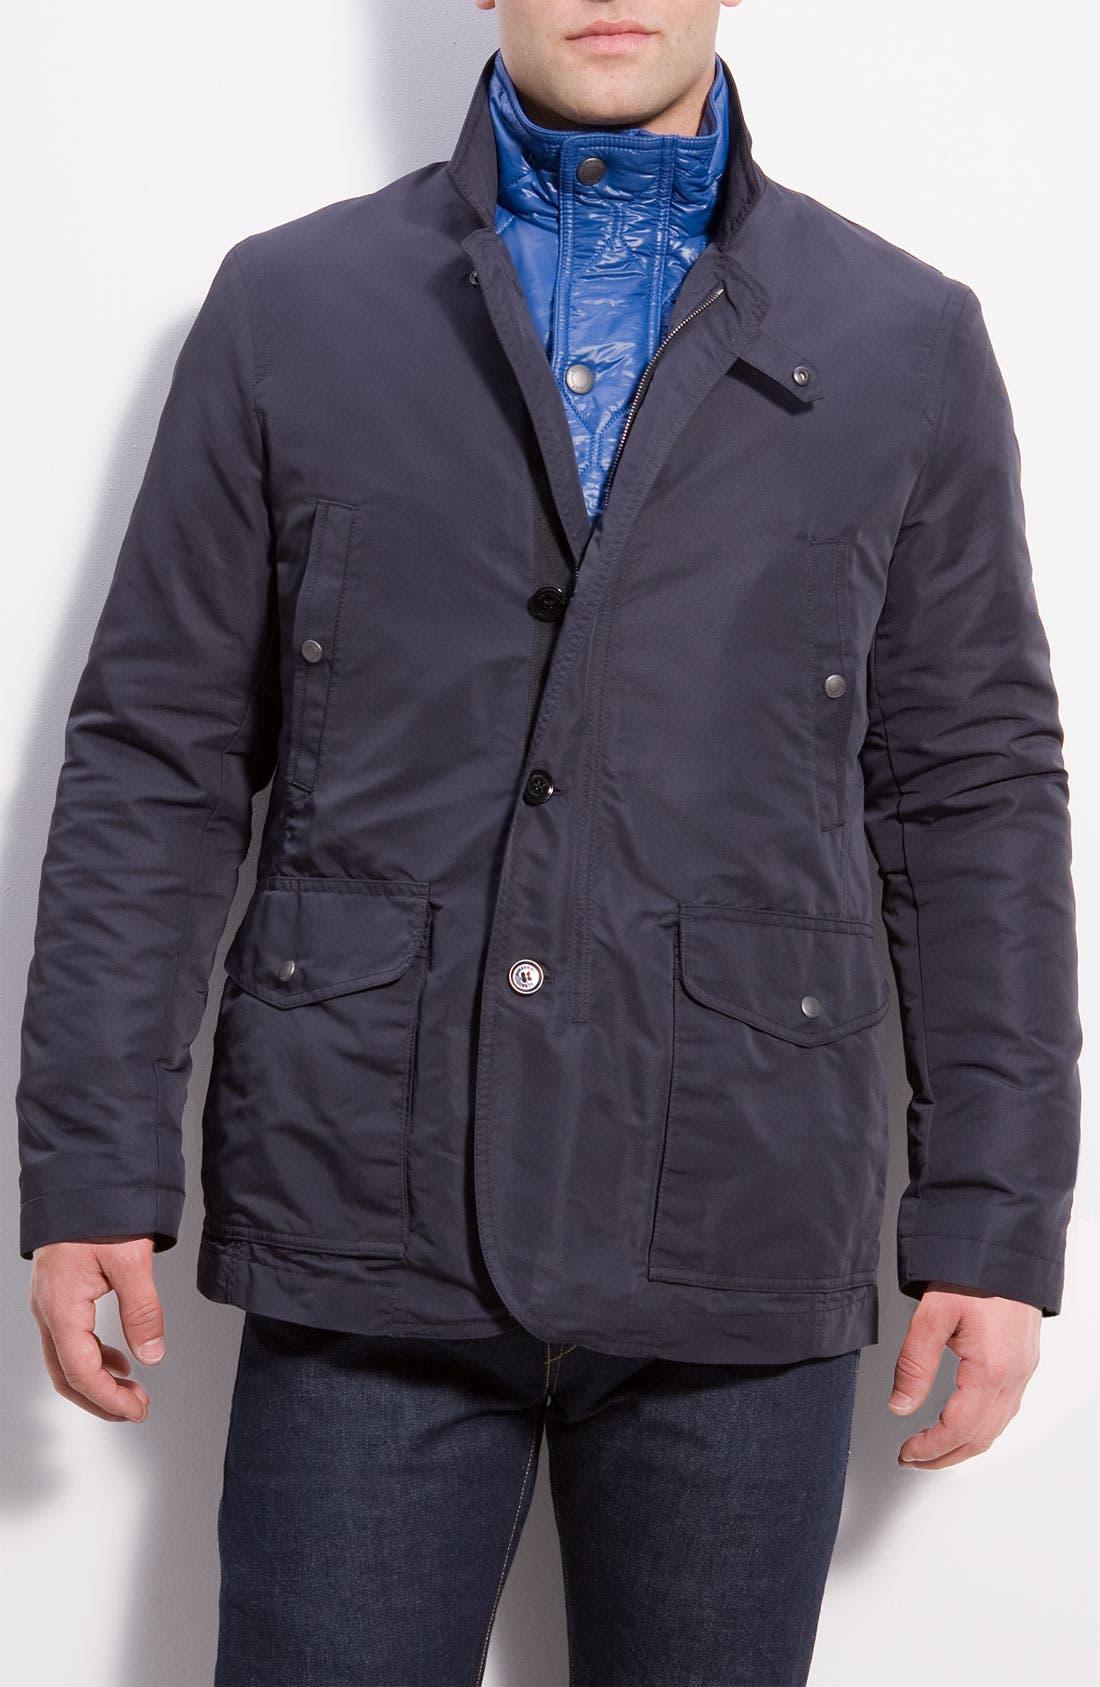 Alternate Image 1 Selected - Burberry Brit Layered Jacket